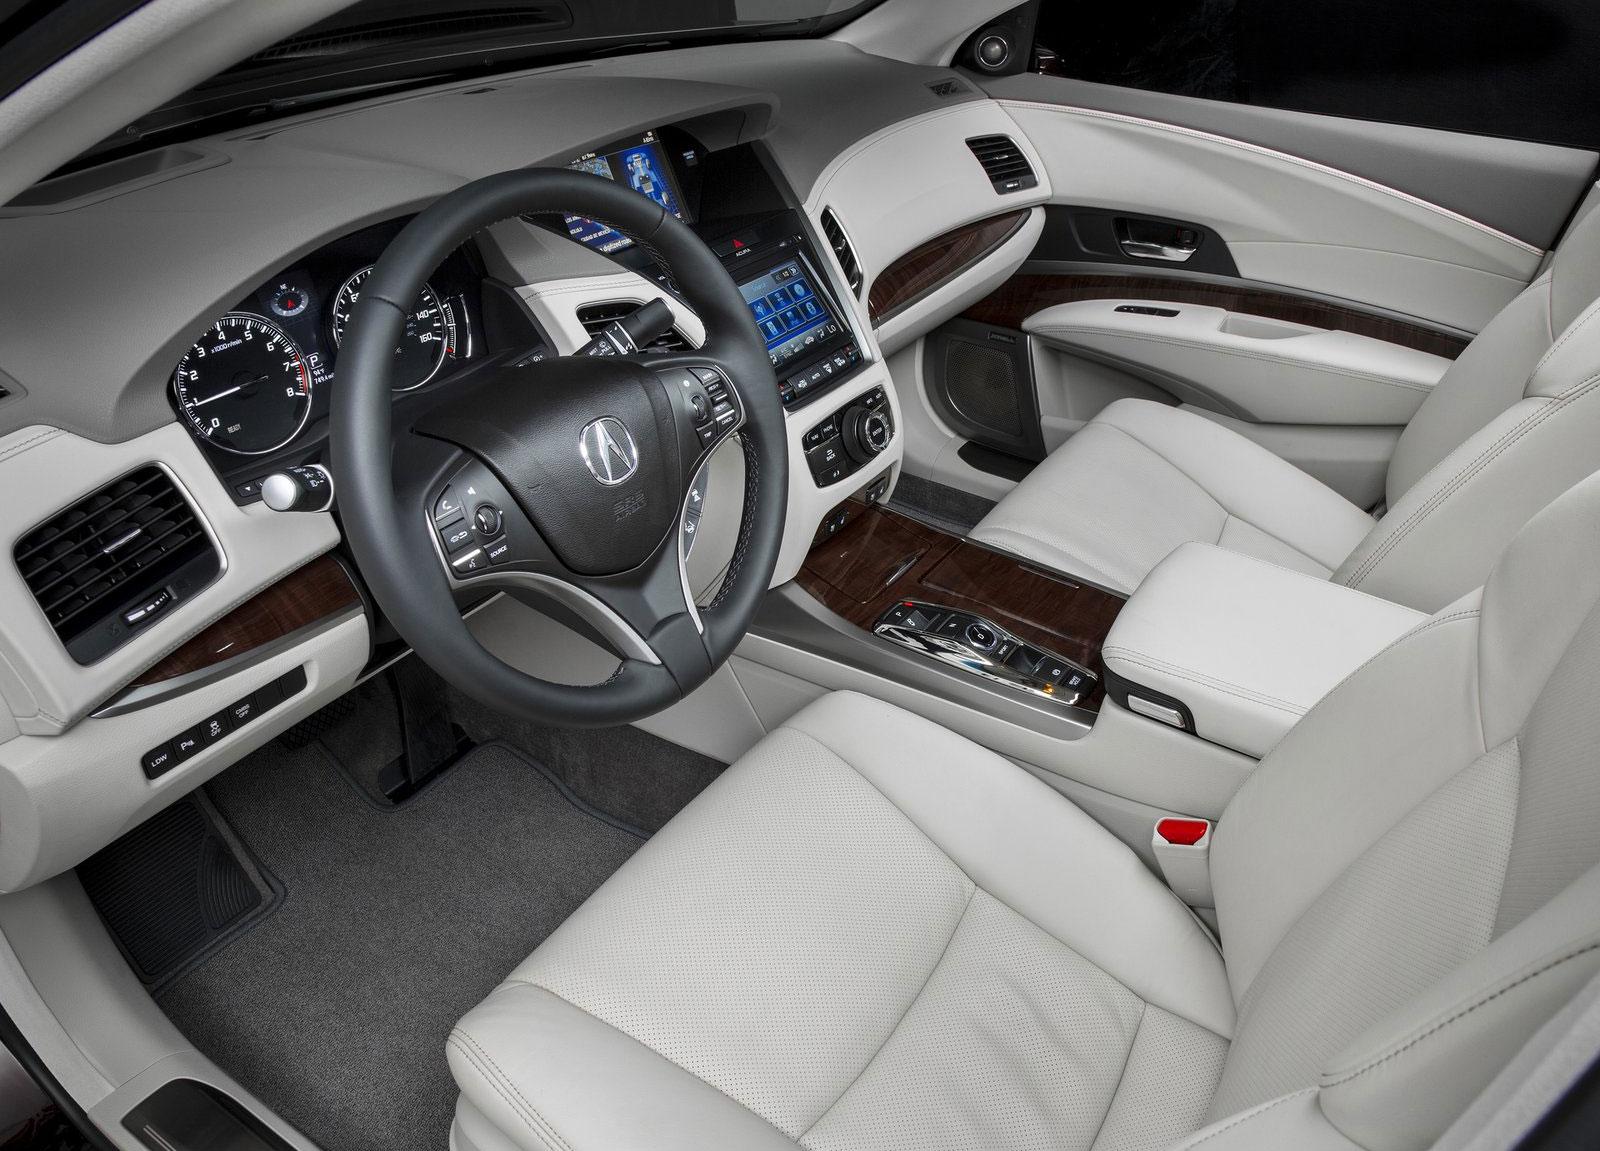 2010 Acura RLX Sport Hybrid photo - 3